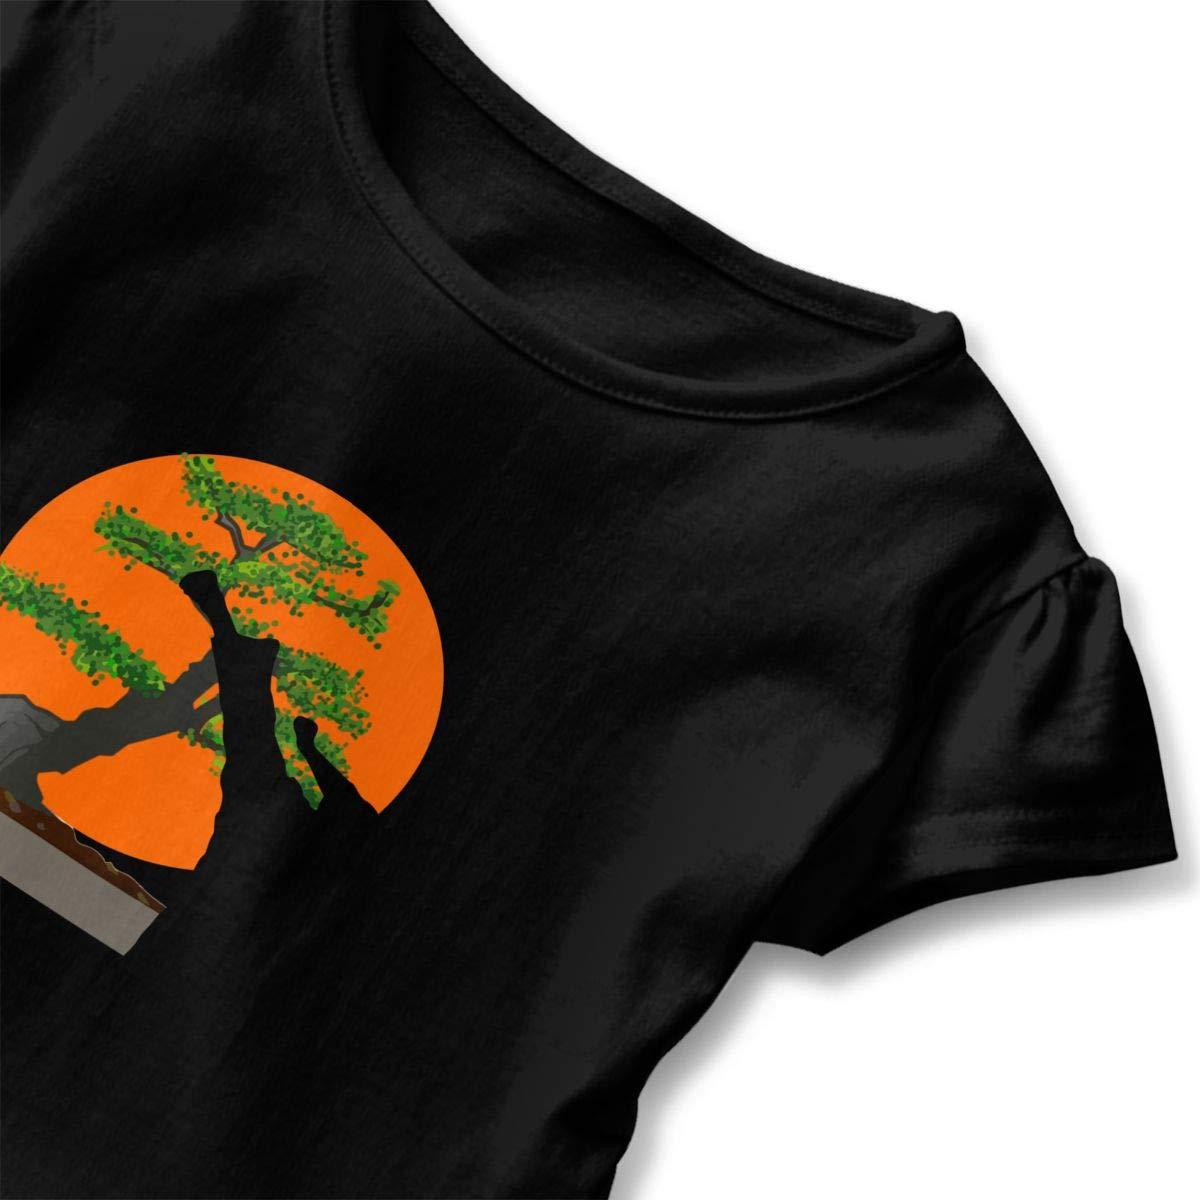 CZnuen Japanese Karate Bonsai Baby Girls Round Neck Short Sleeve Ruffle T-Shirt Top